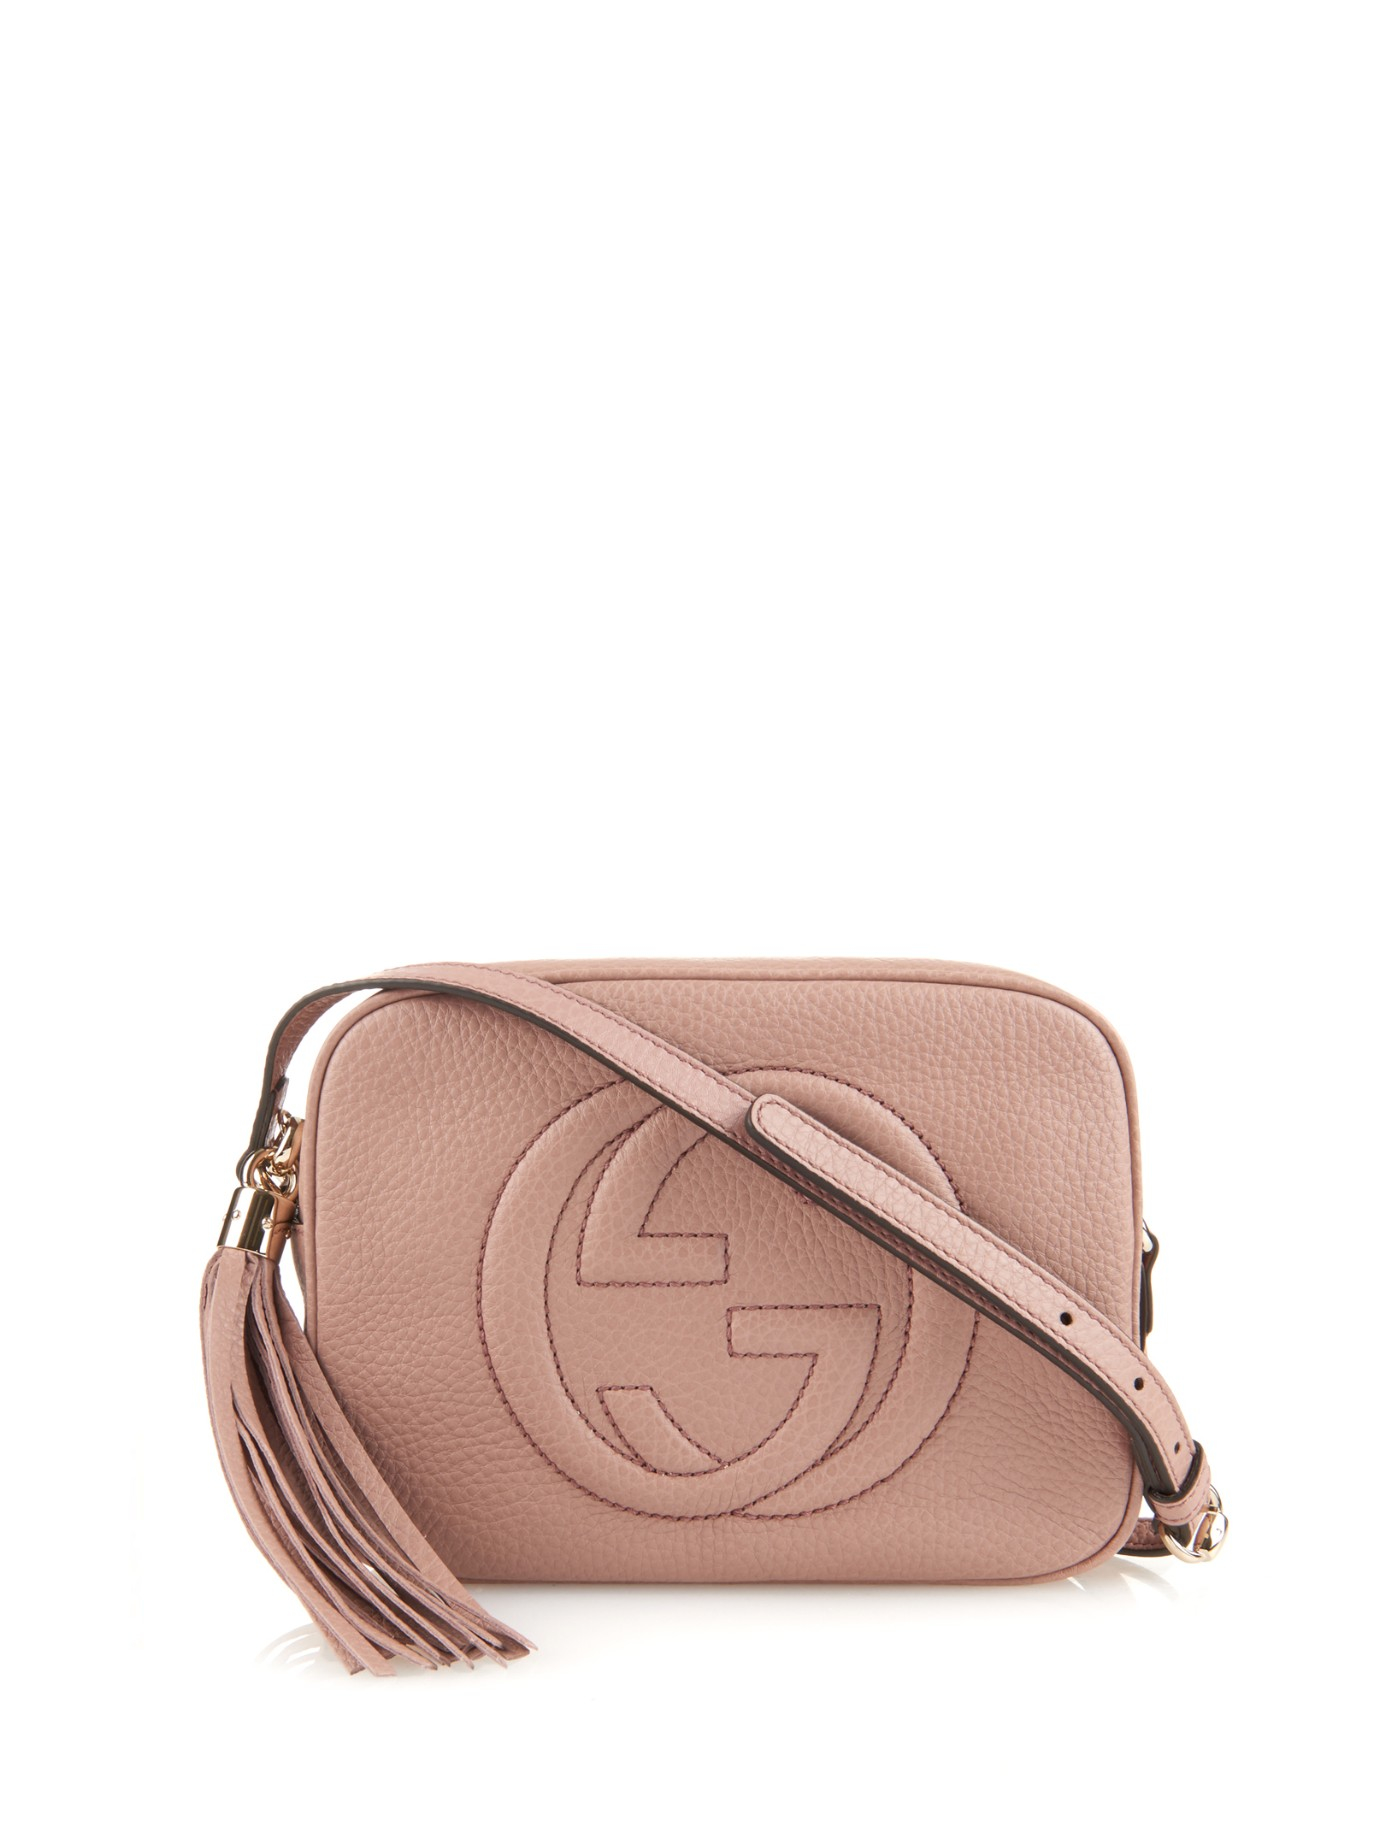 567240b659ec1e Lyst - Gucci Soho Leather Cross-Body Bag in Pink